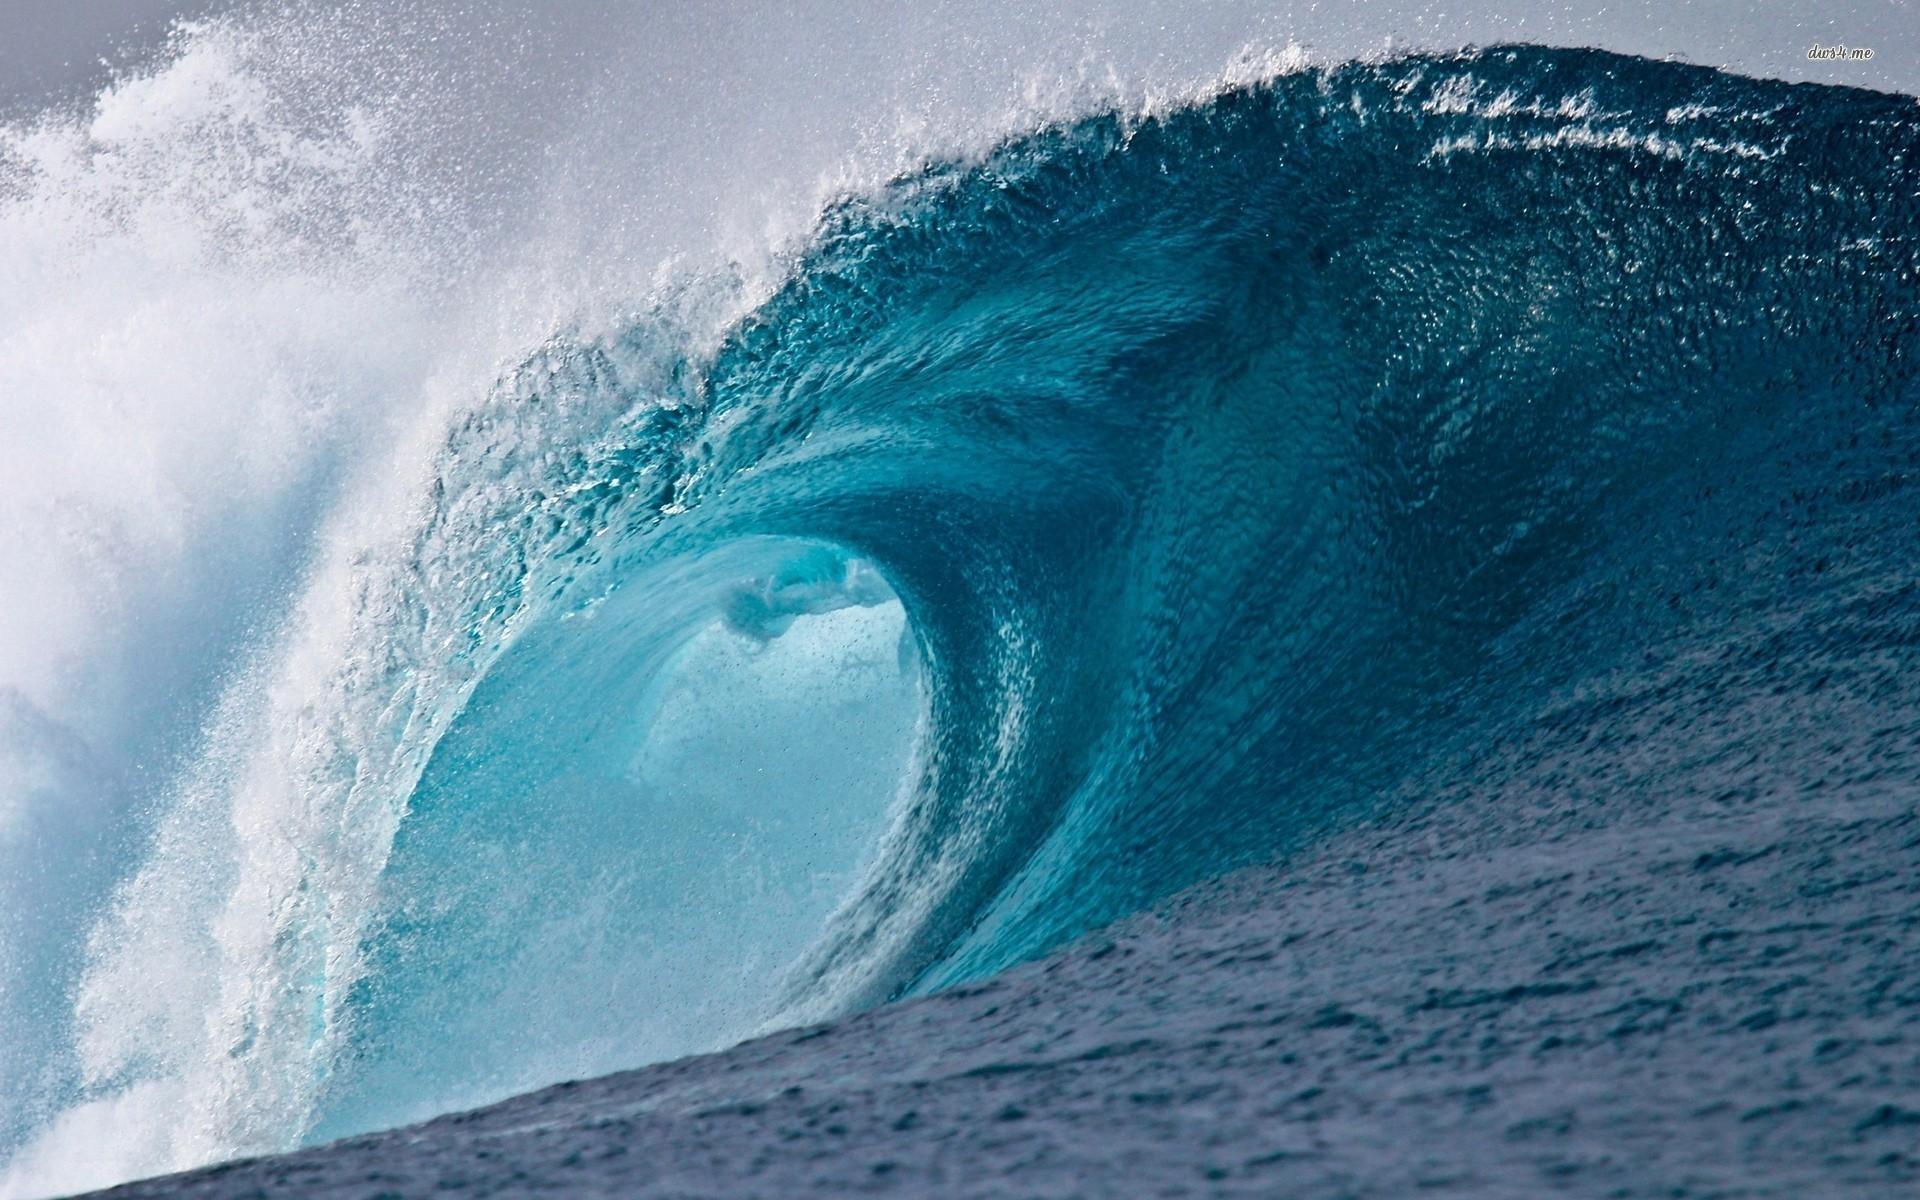 Hd Wallpapers 1080p Ocean: Beach Waves Wallpapers For Desktop (55+ Images